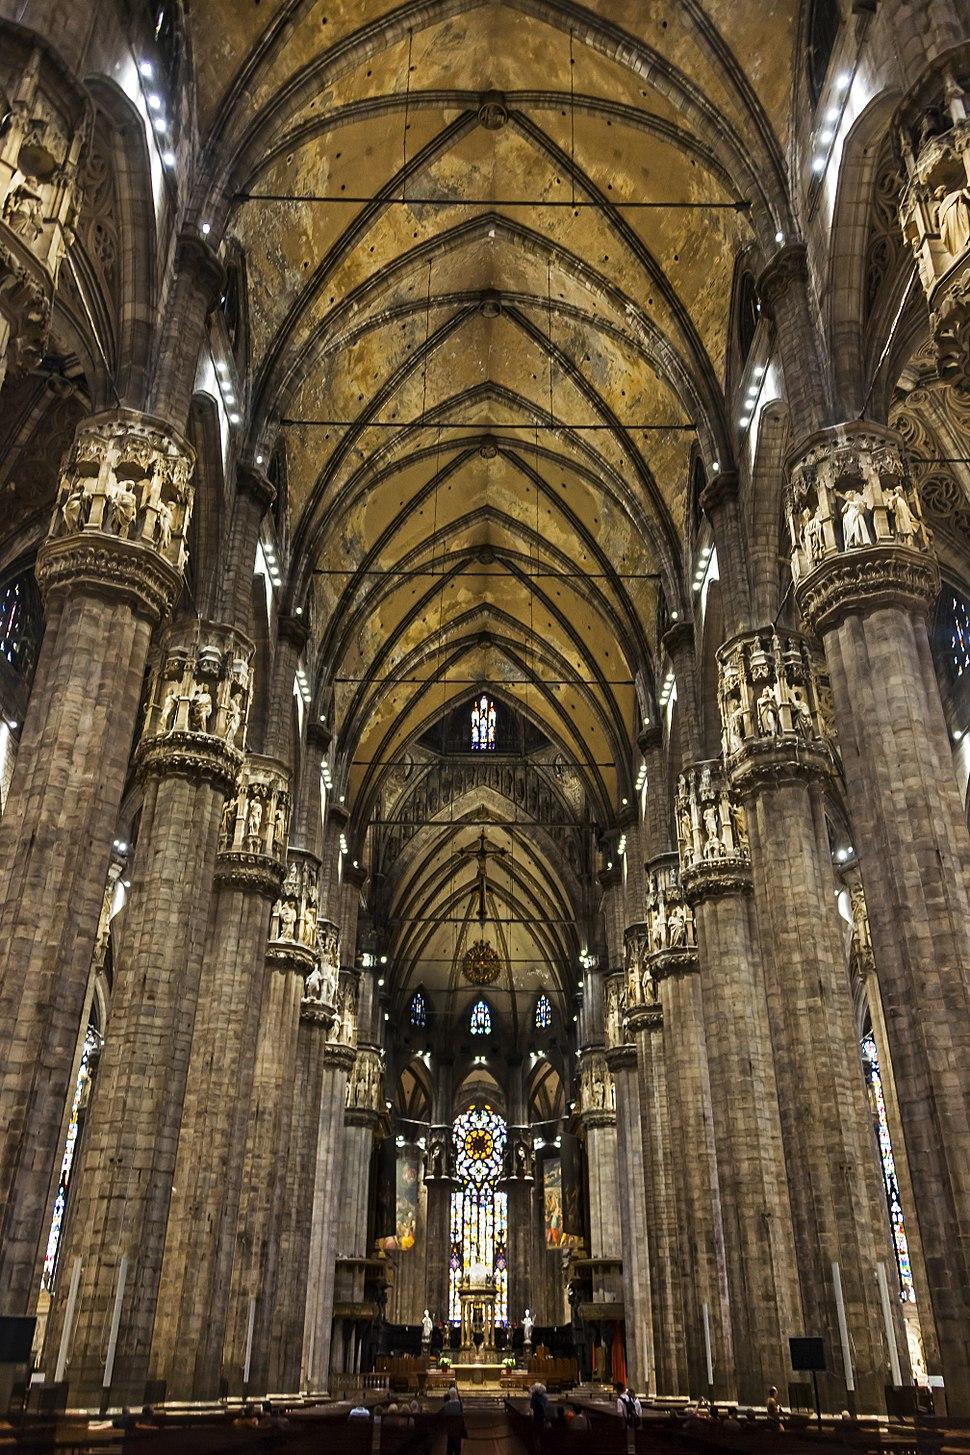 Interior of Il Duomo, Milan